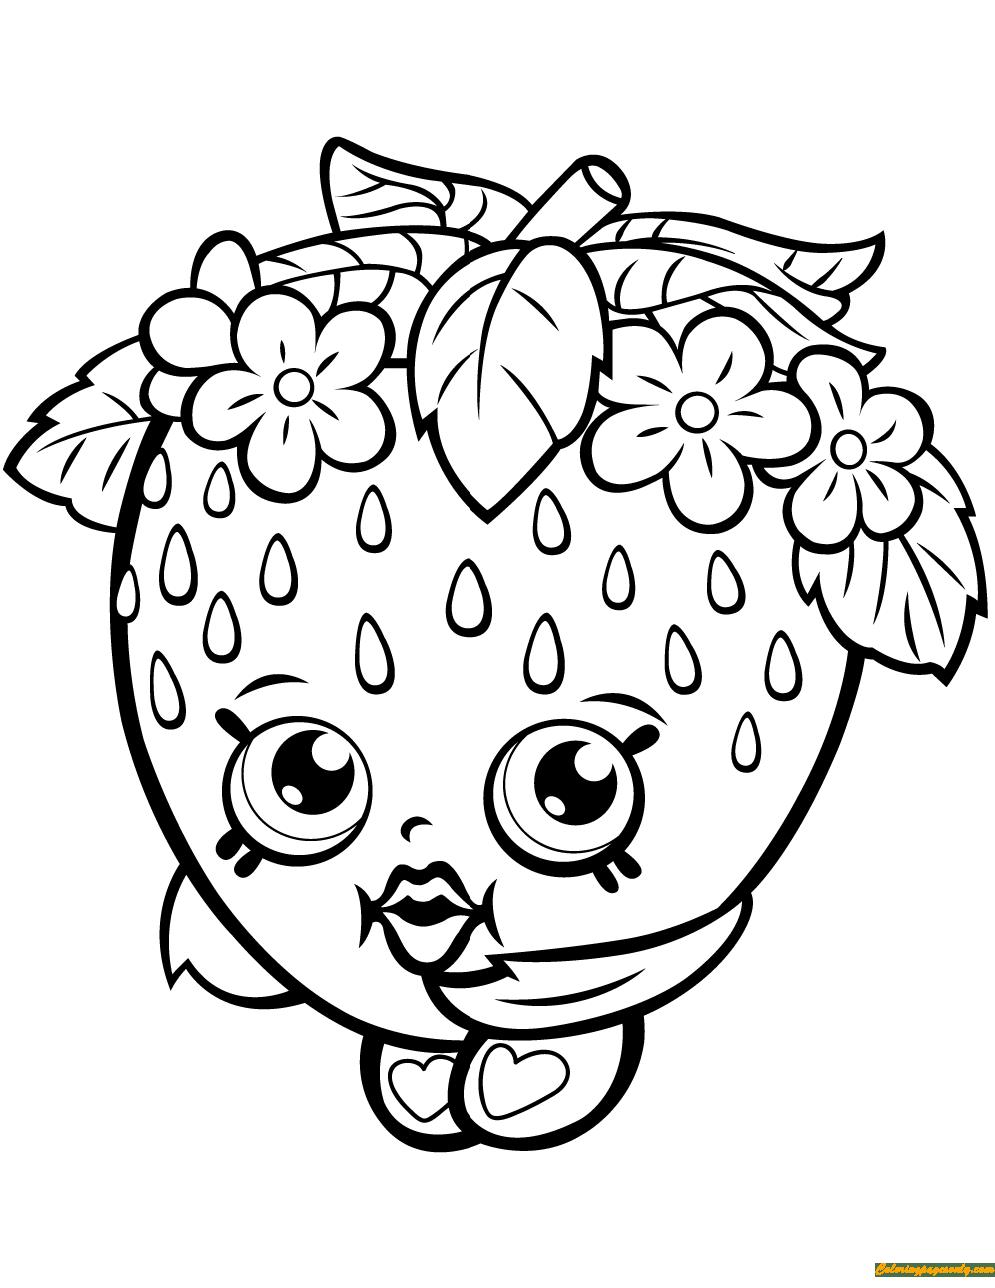 Strawberry Kiss Shopkin Season 1 Coloring Page Free Coloring